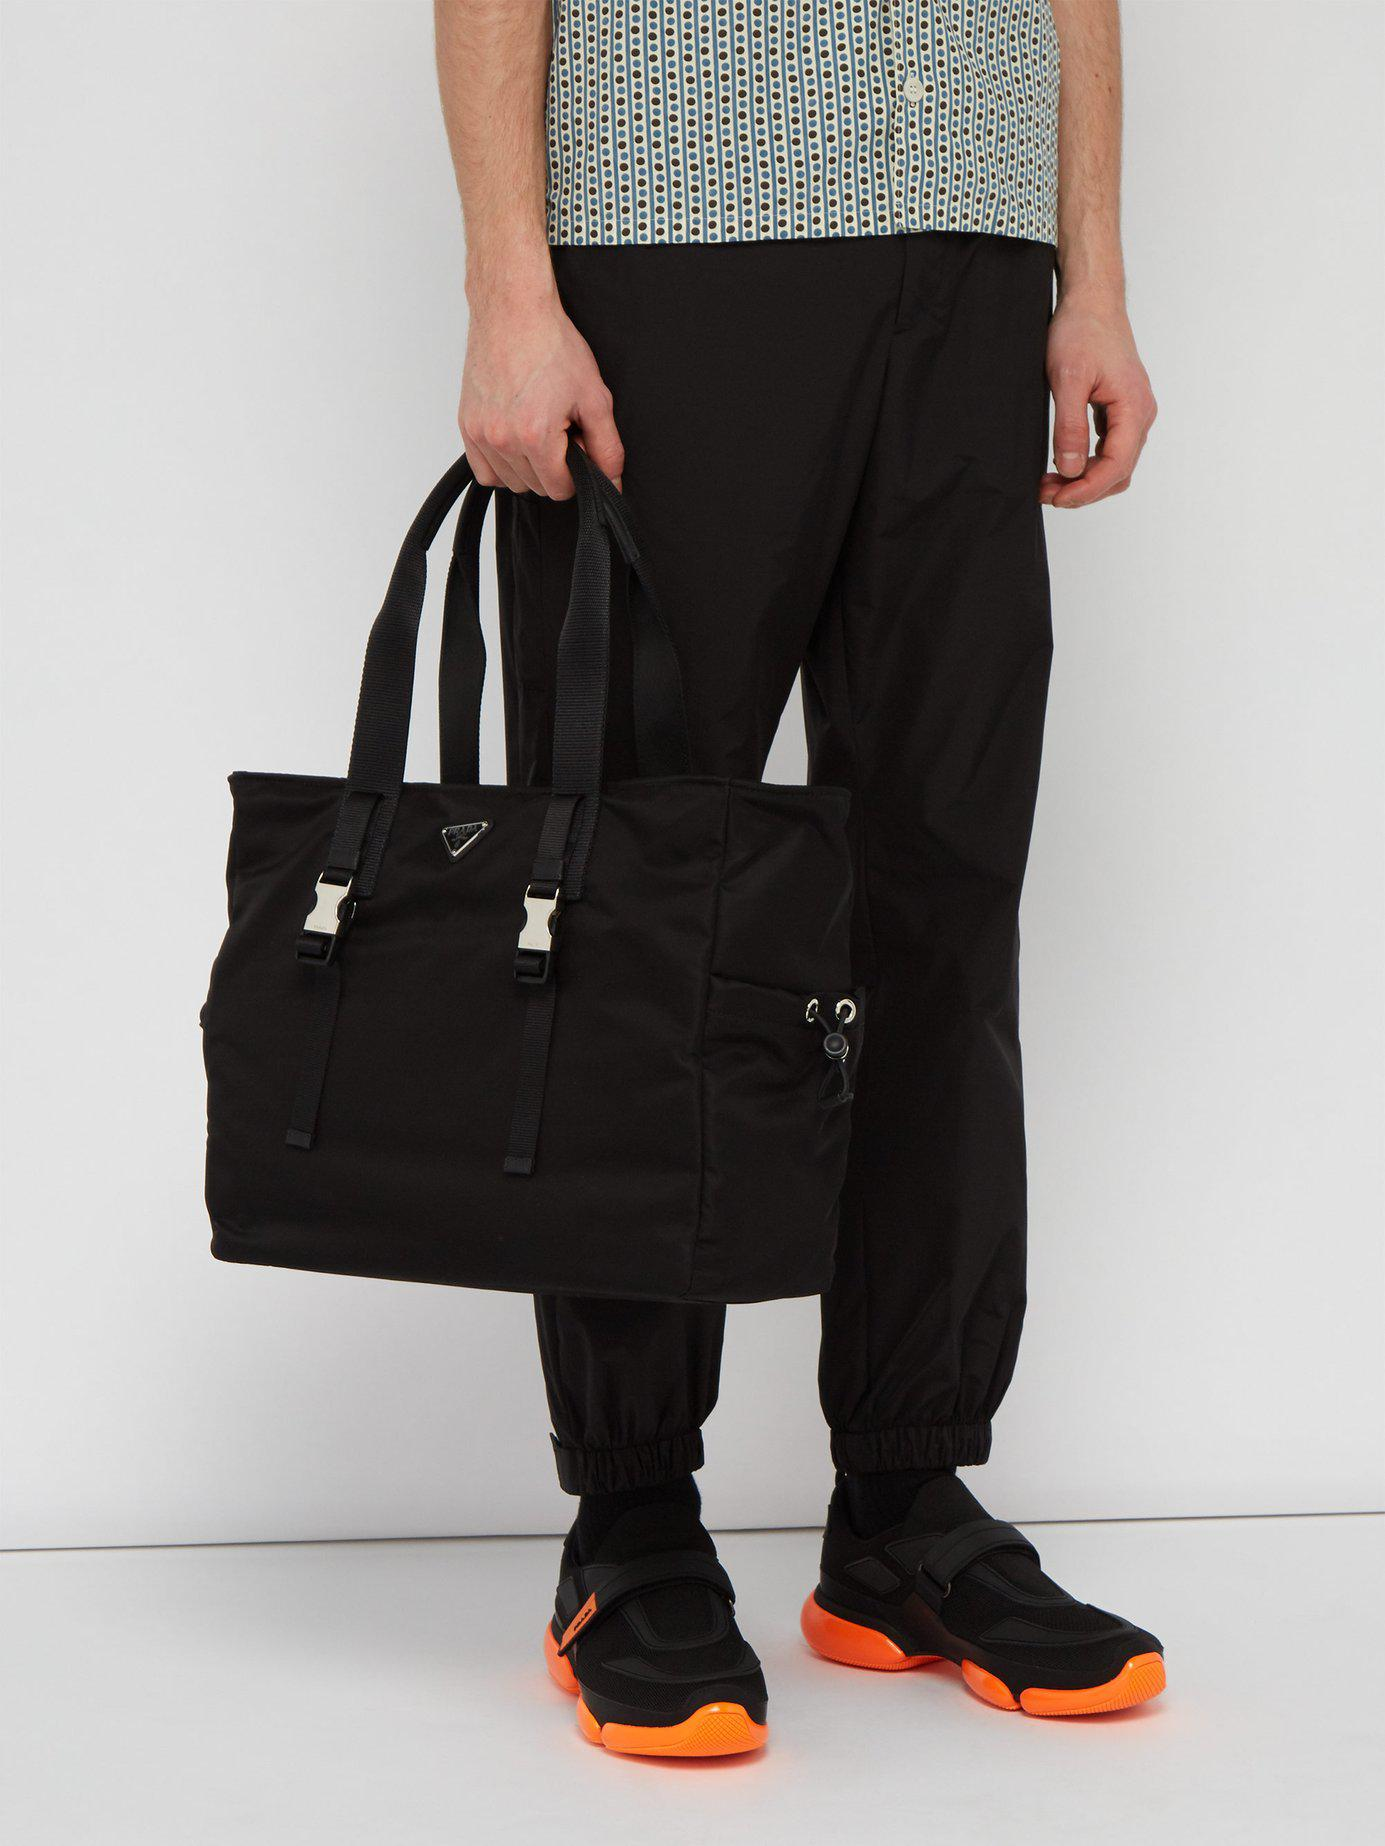 5b2cbf9b530f4a Lyst - Prada Nylon Weekend Bag in Black for Men - Save 20%